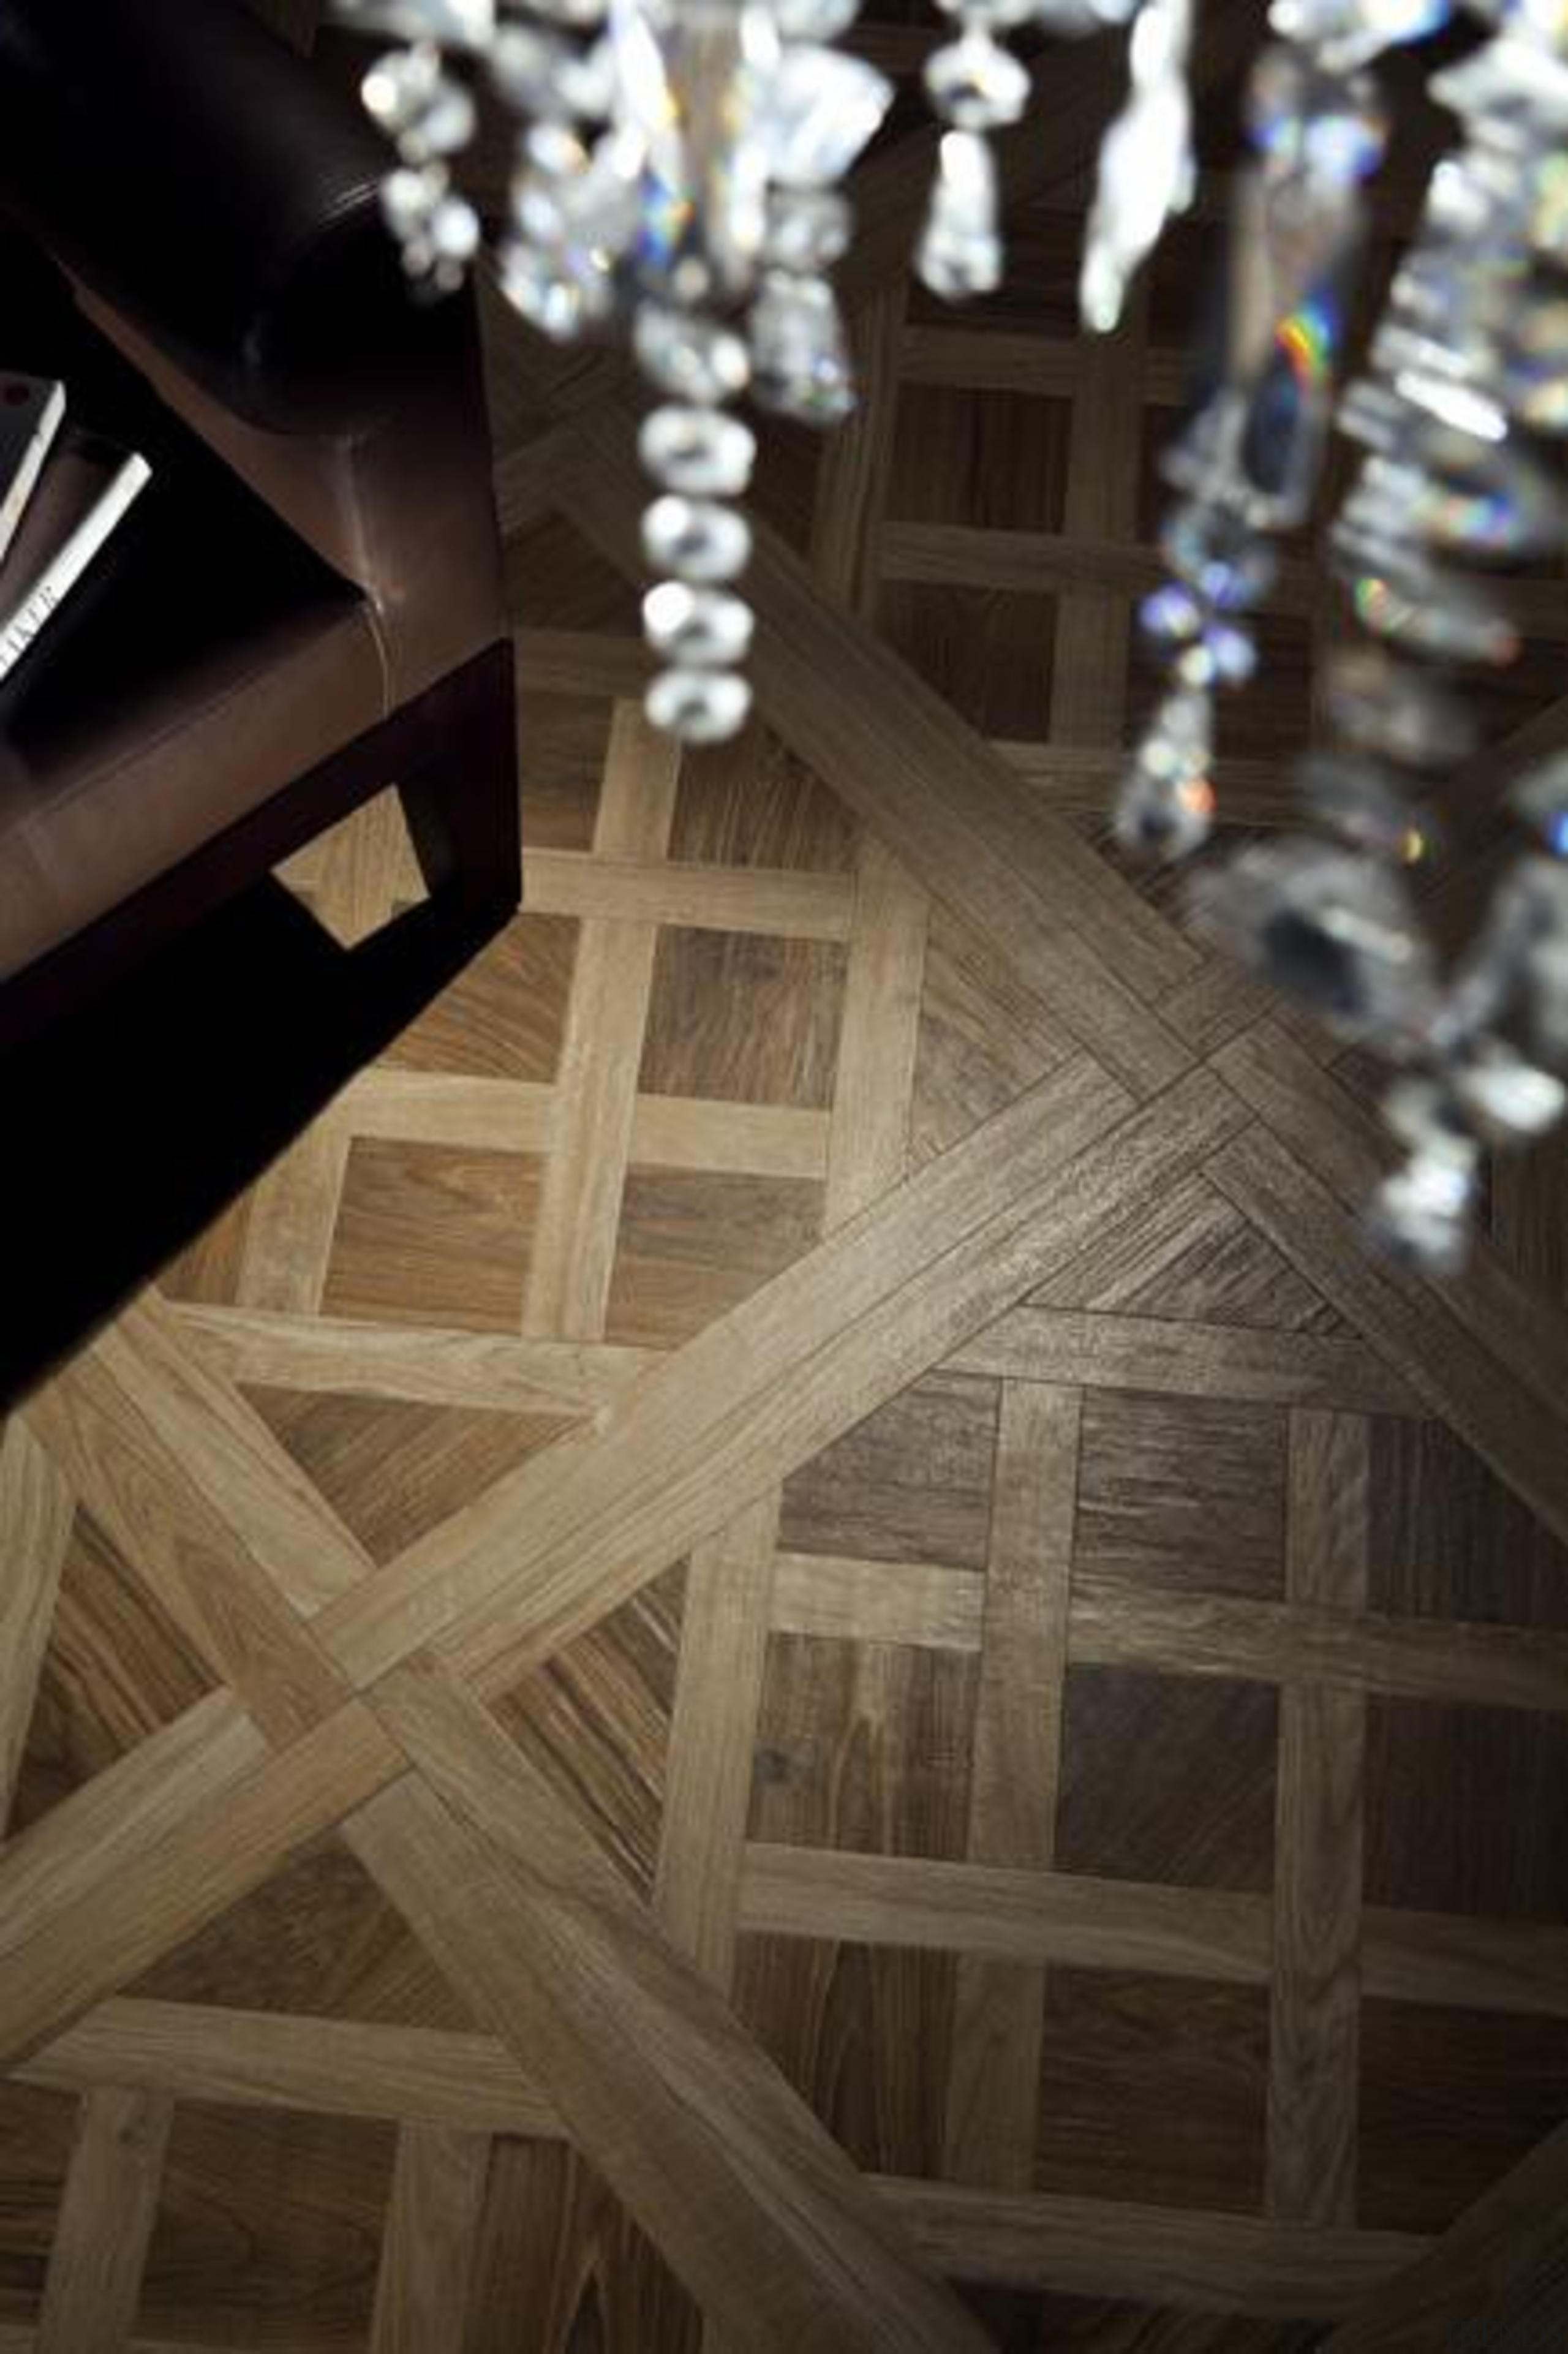 The charm of antique parquet flooring is now floor, flooring, light, lighting, wood, black, brown